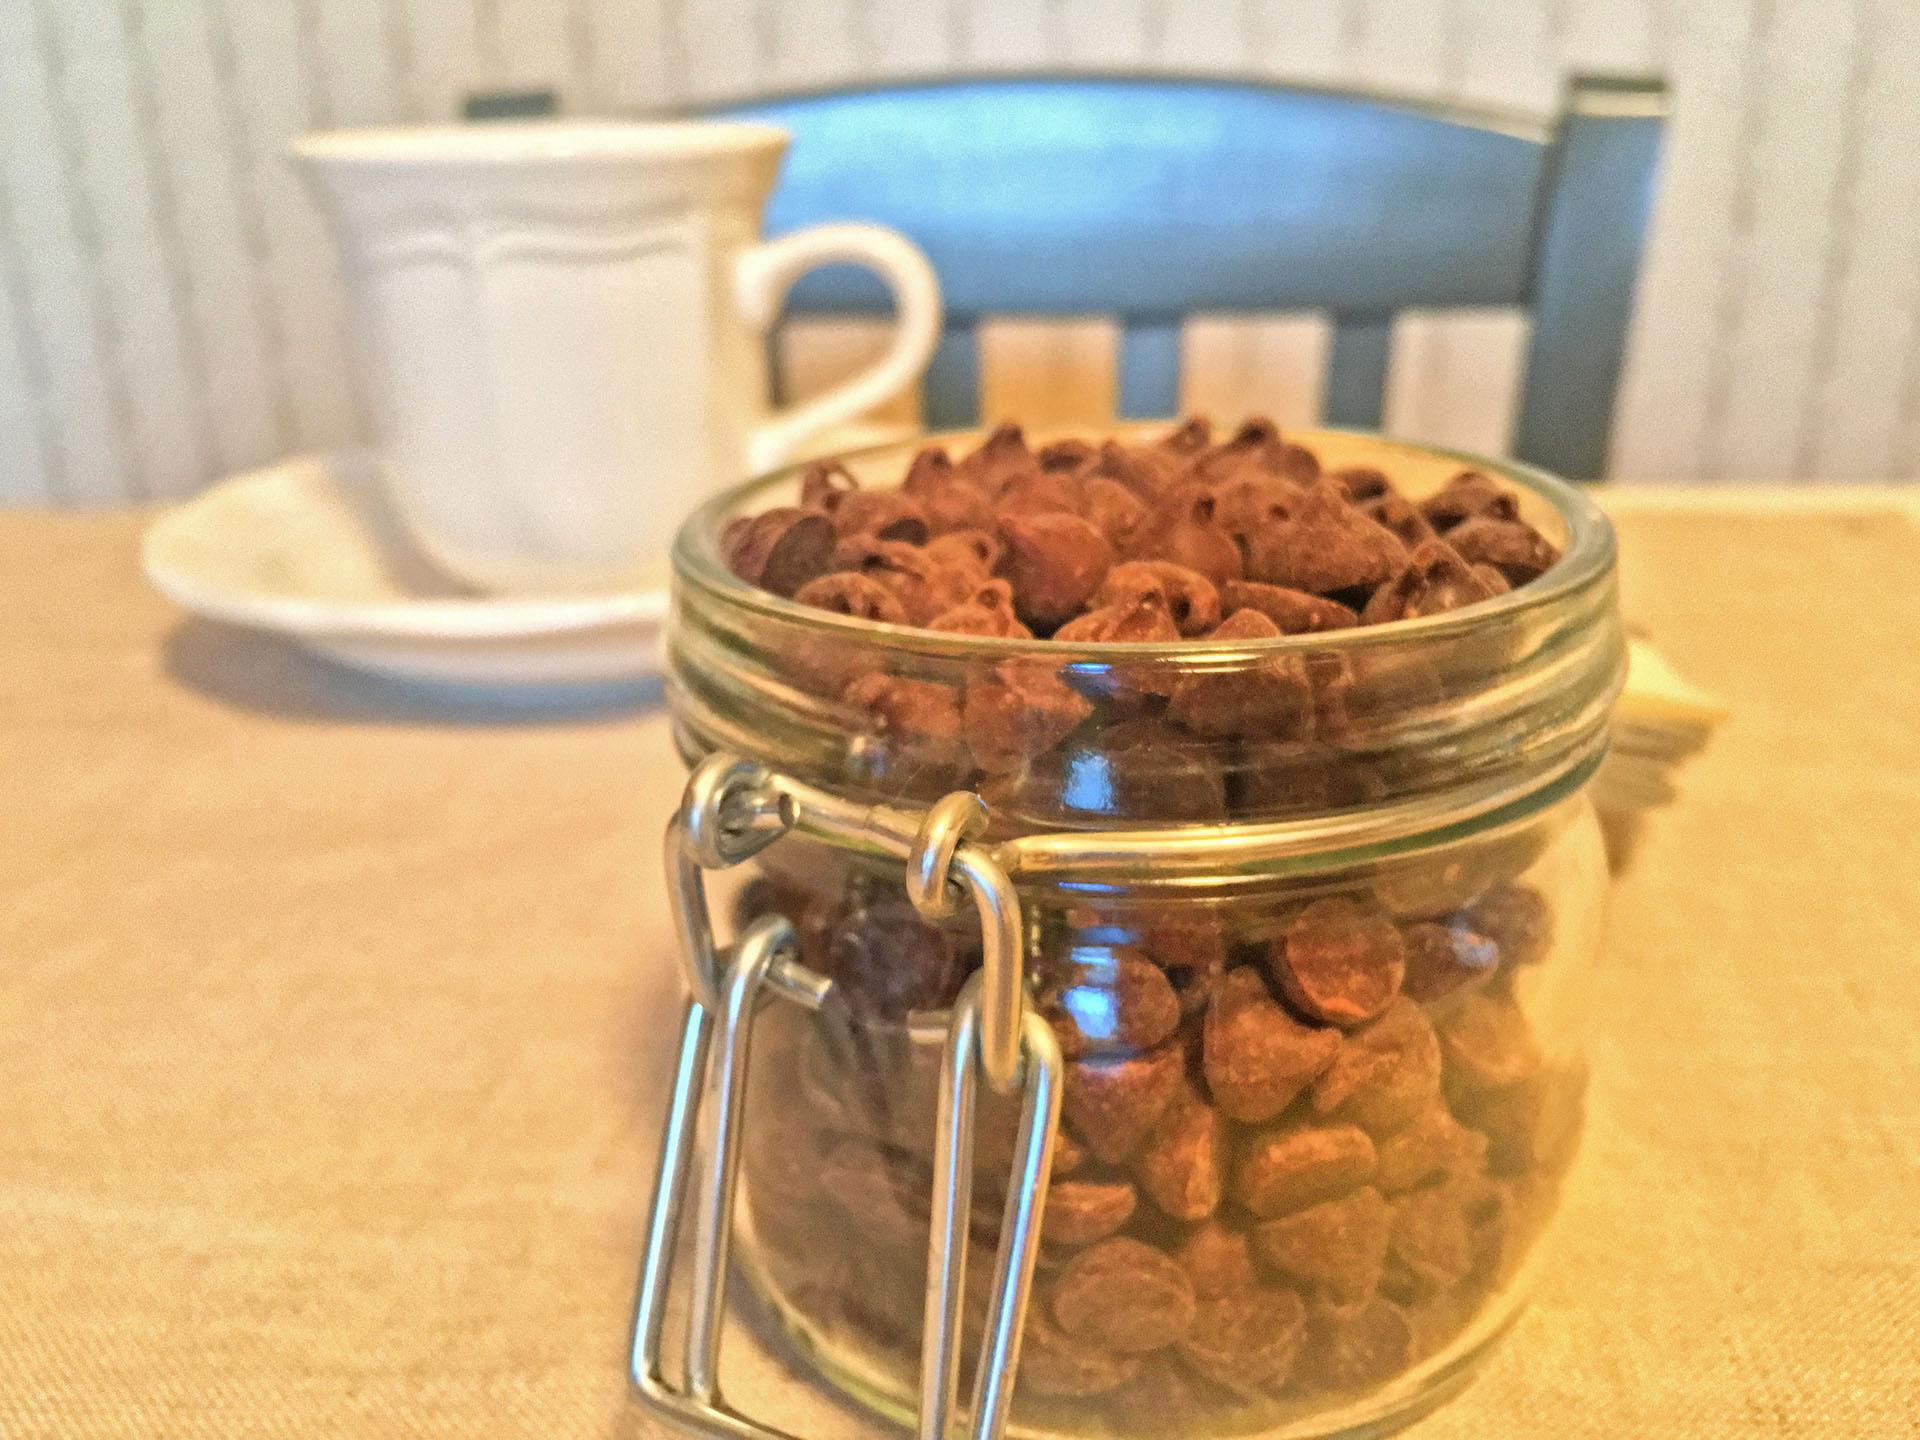 Earth Fare Bulk Chocolate Chips